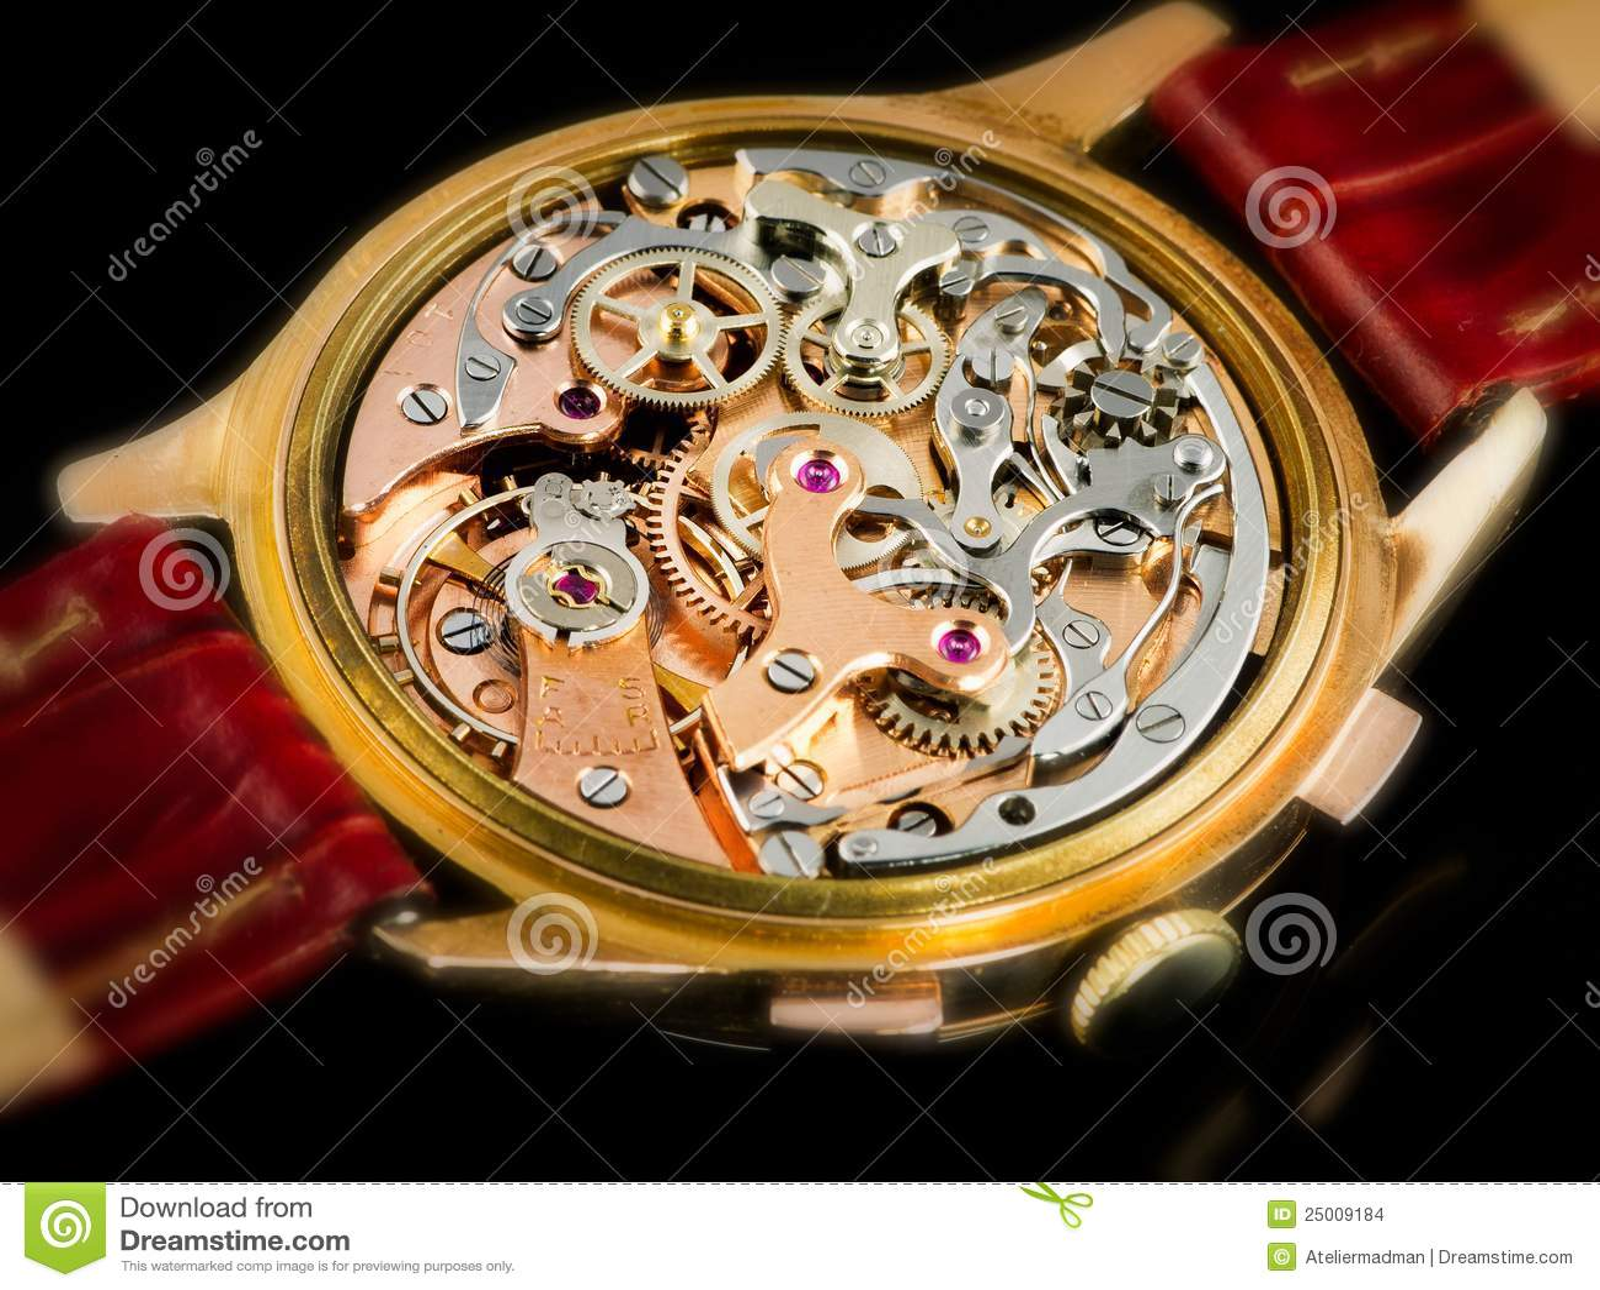 chronographe watch movement valjoux 23 stock photo Parts Manual Service ManualsOnline